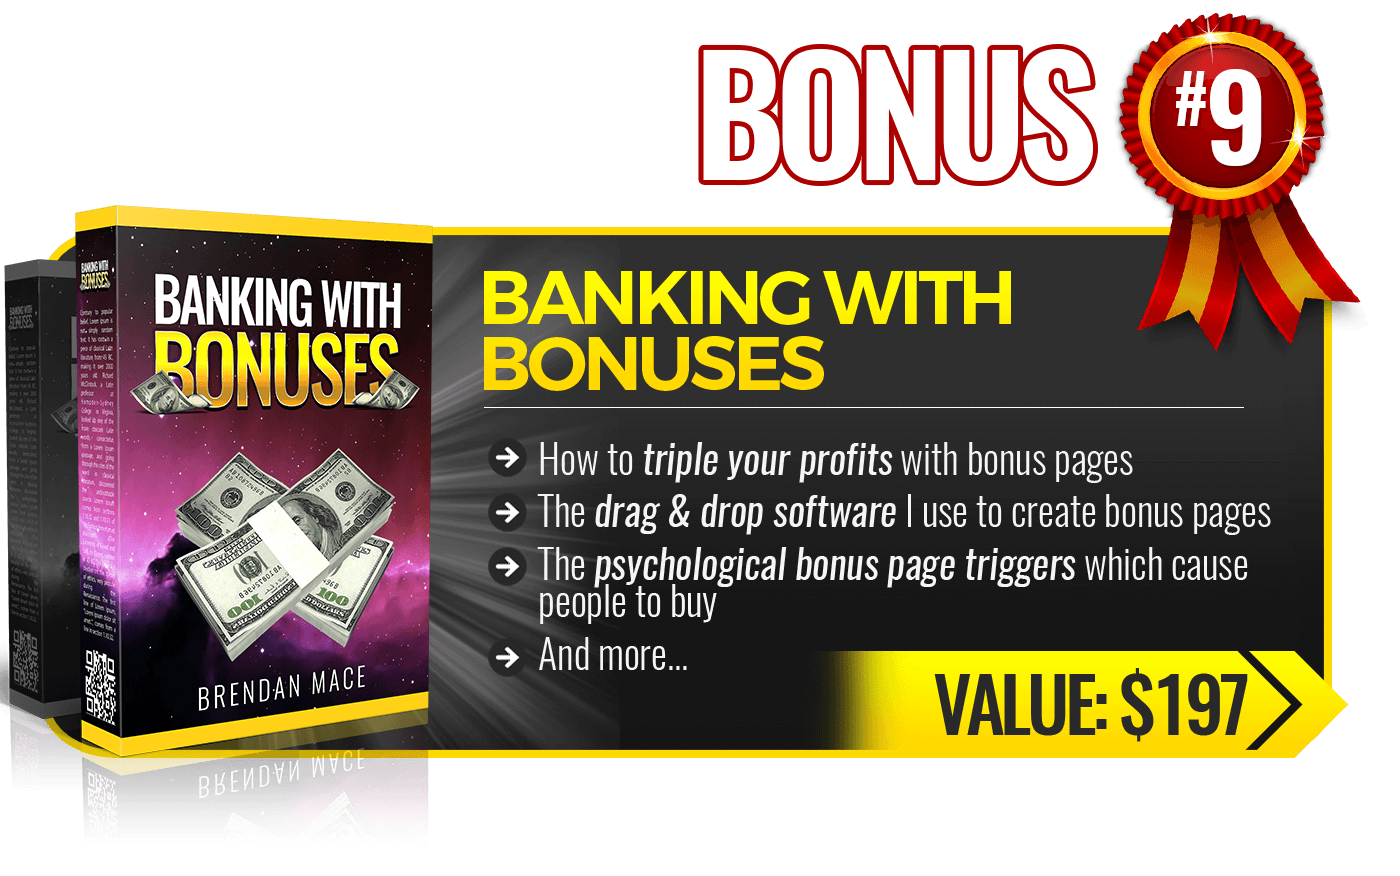 9. Banking With Bonuses